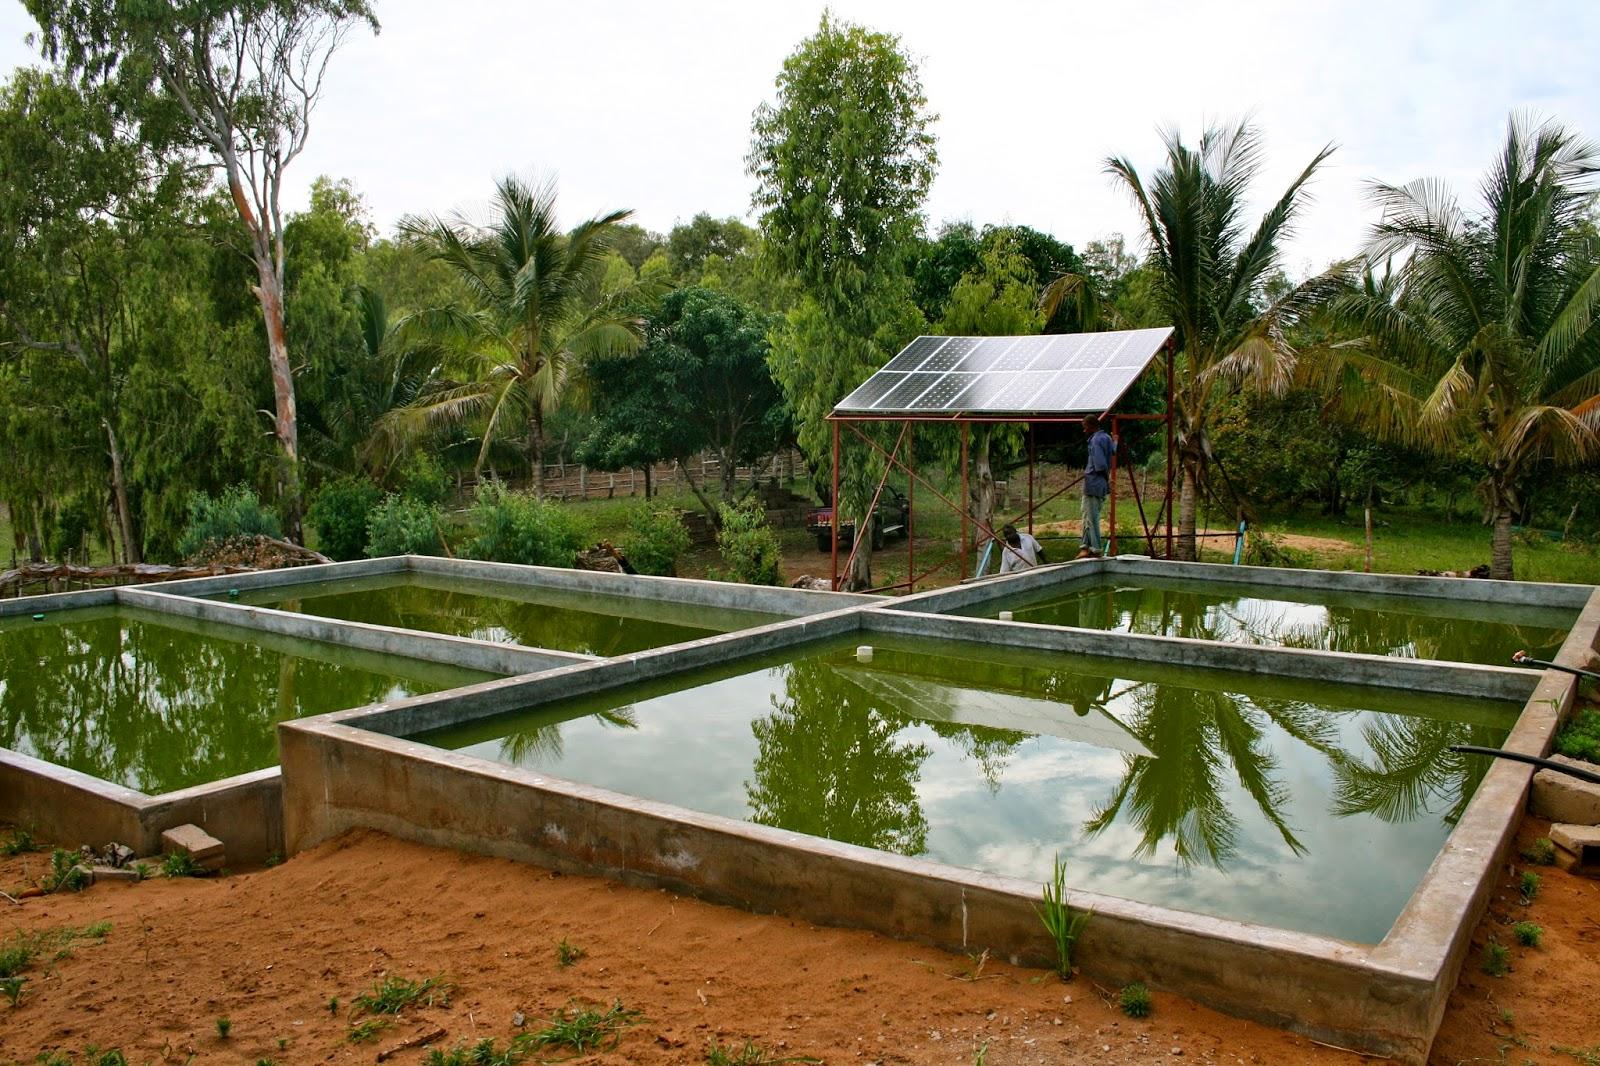 Tilapia or catfish farming can be done zimbabwe farming for Fish farming business